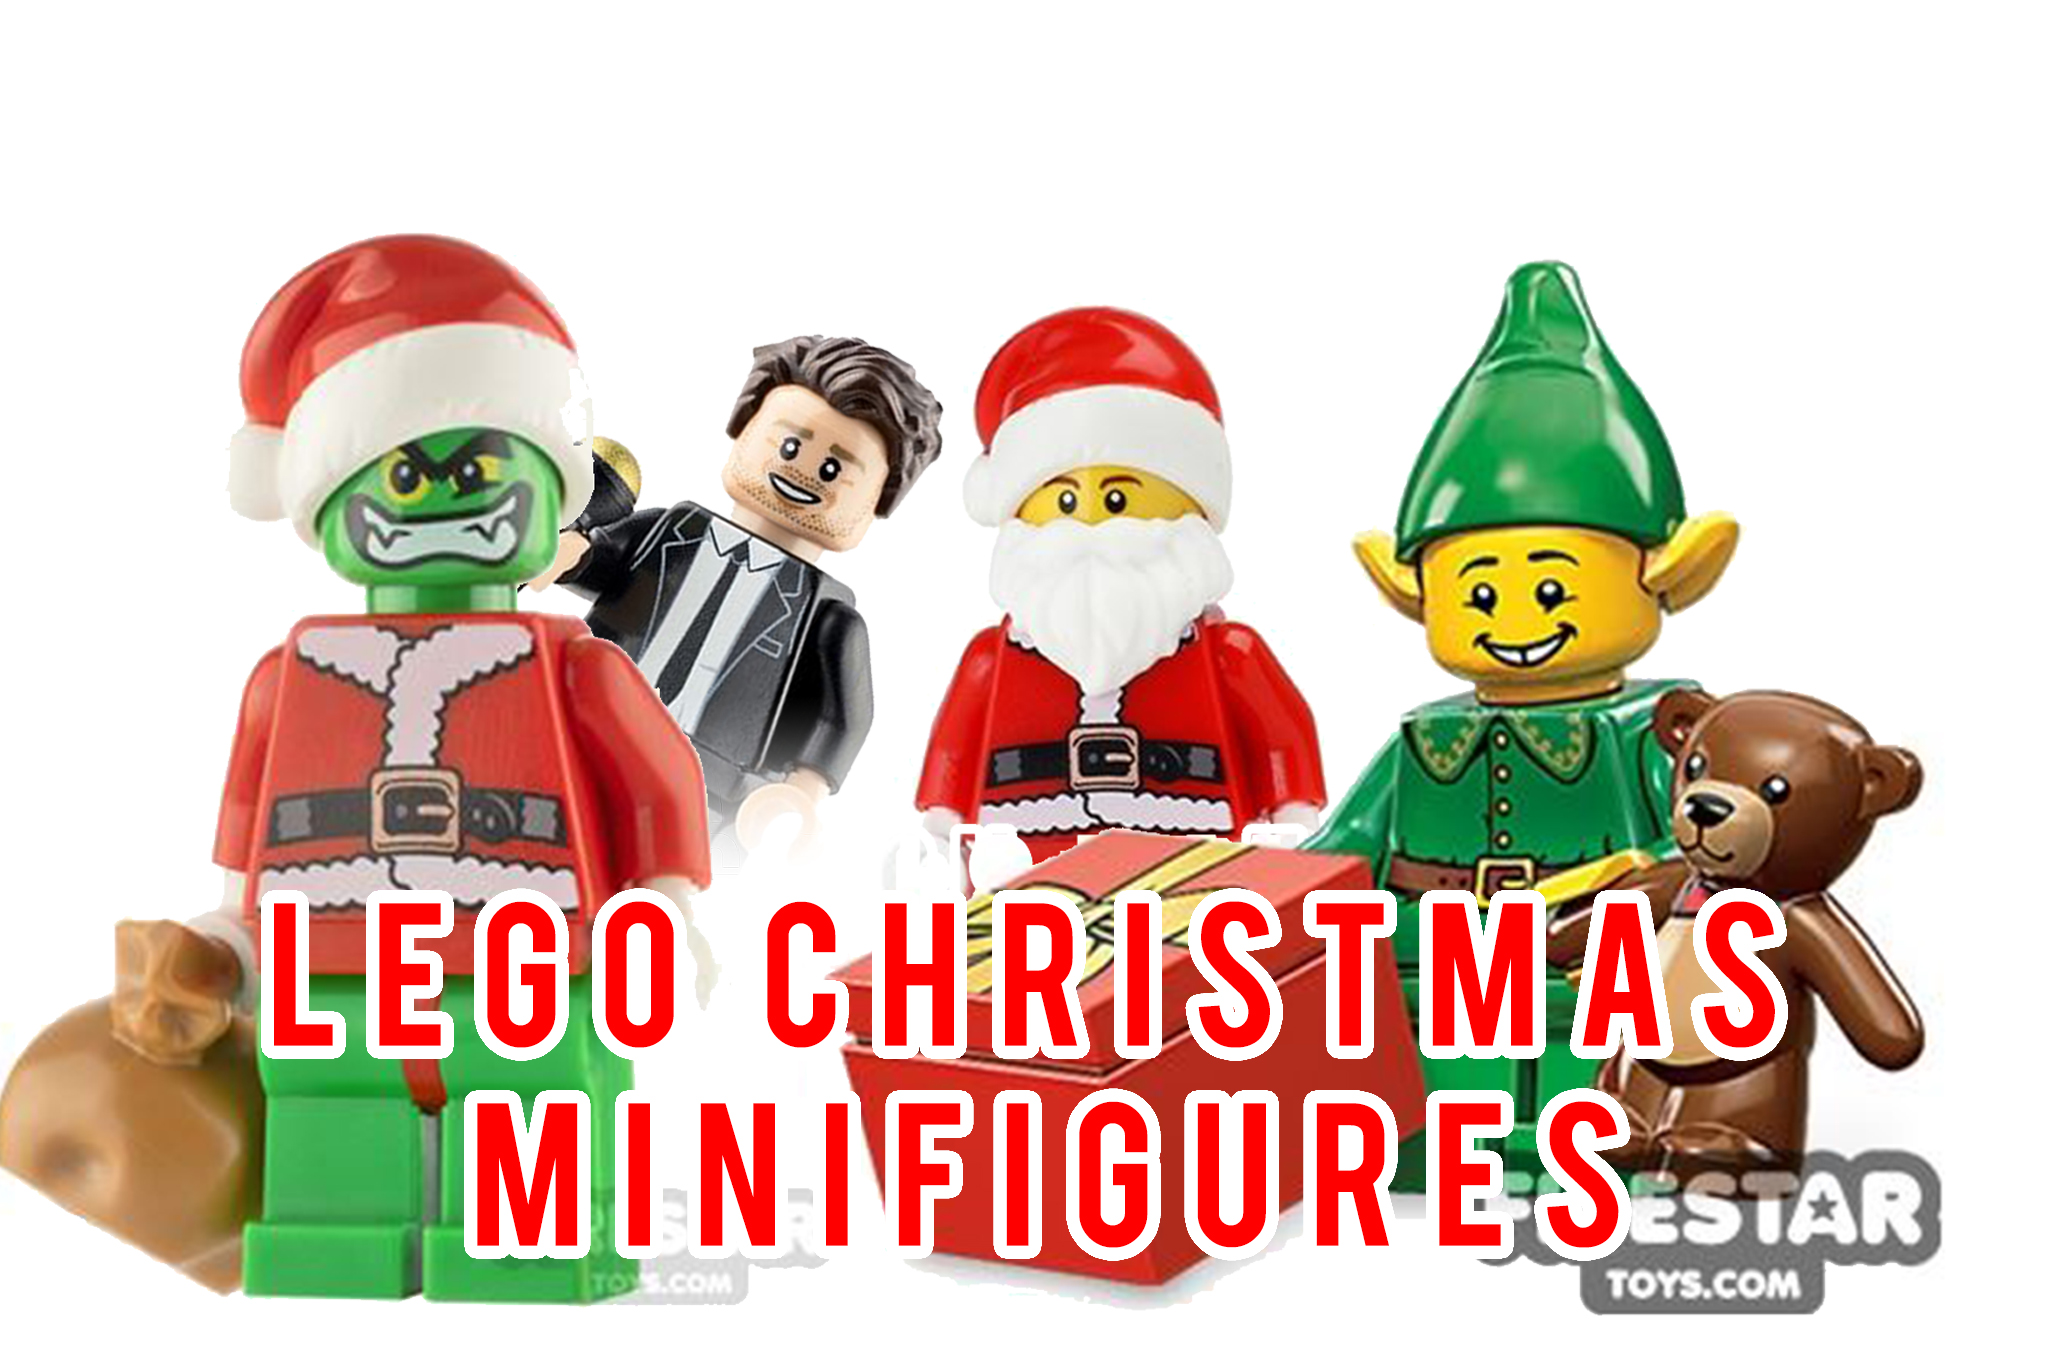 LEGO Christmas Minifigures - Header Image of Grinch, Buble, Santa and Elf